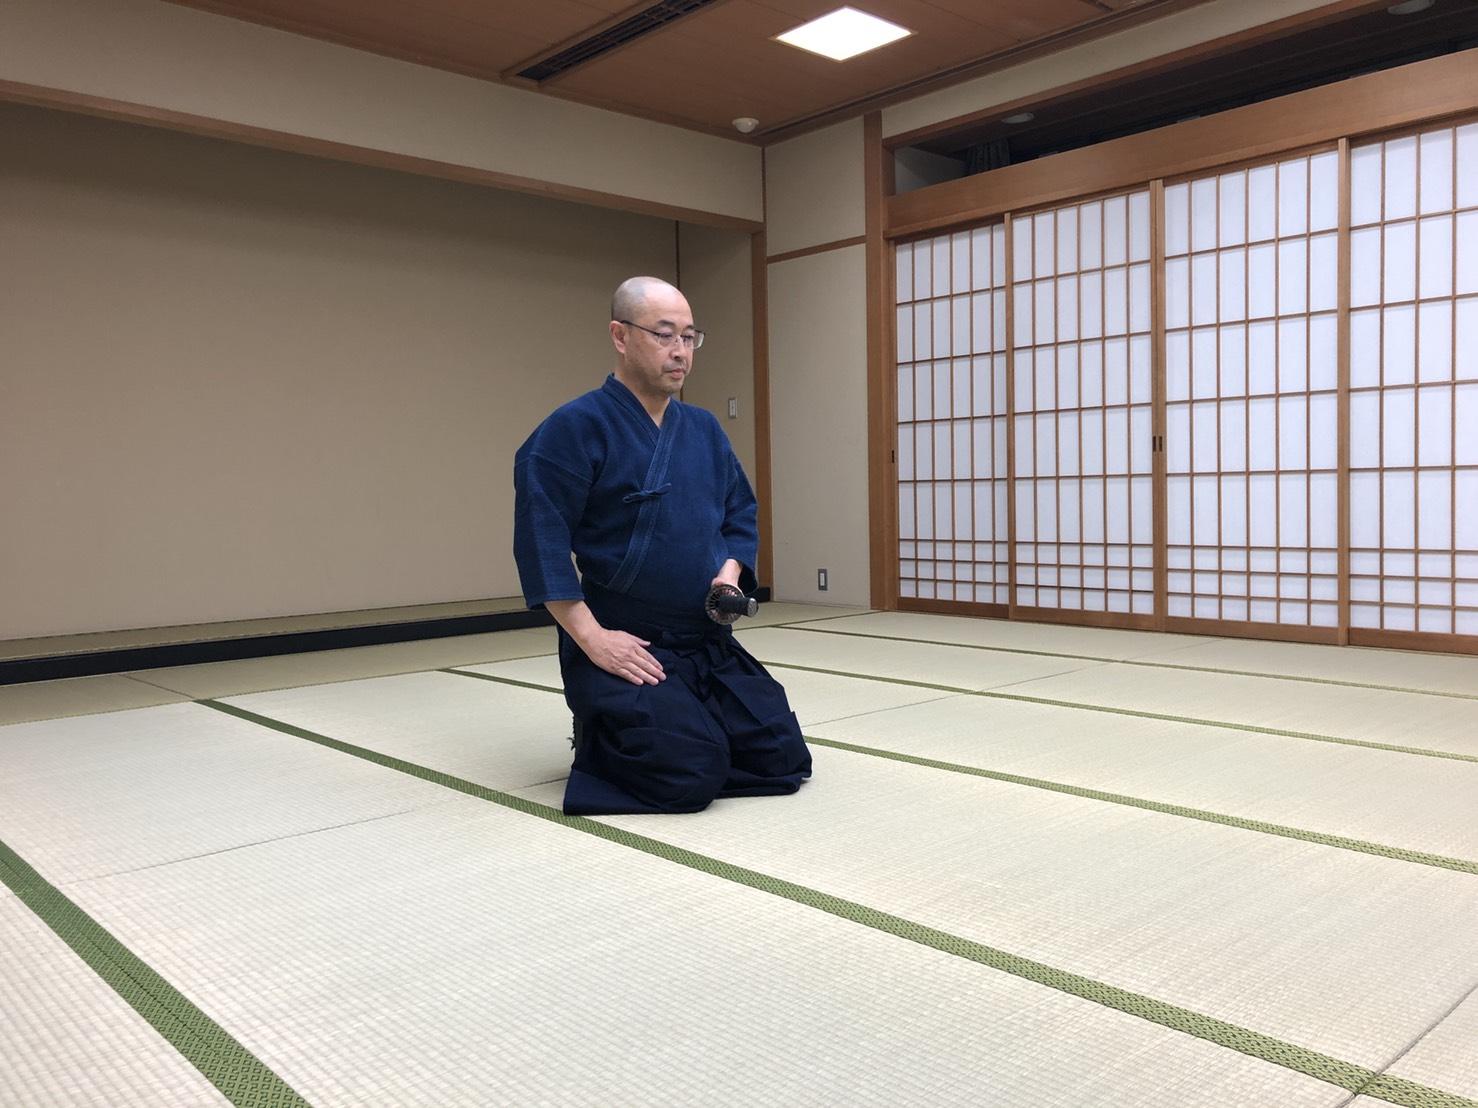 S  84181020 - 釈正輪老師、武道礼法&呼吸法開催